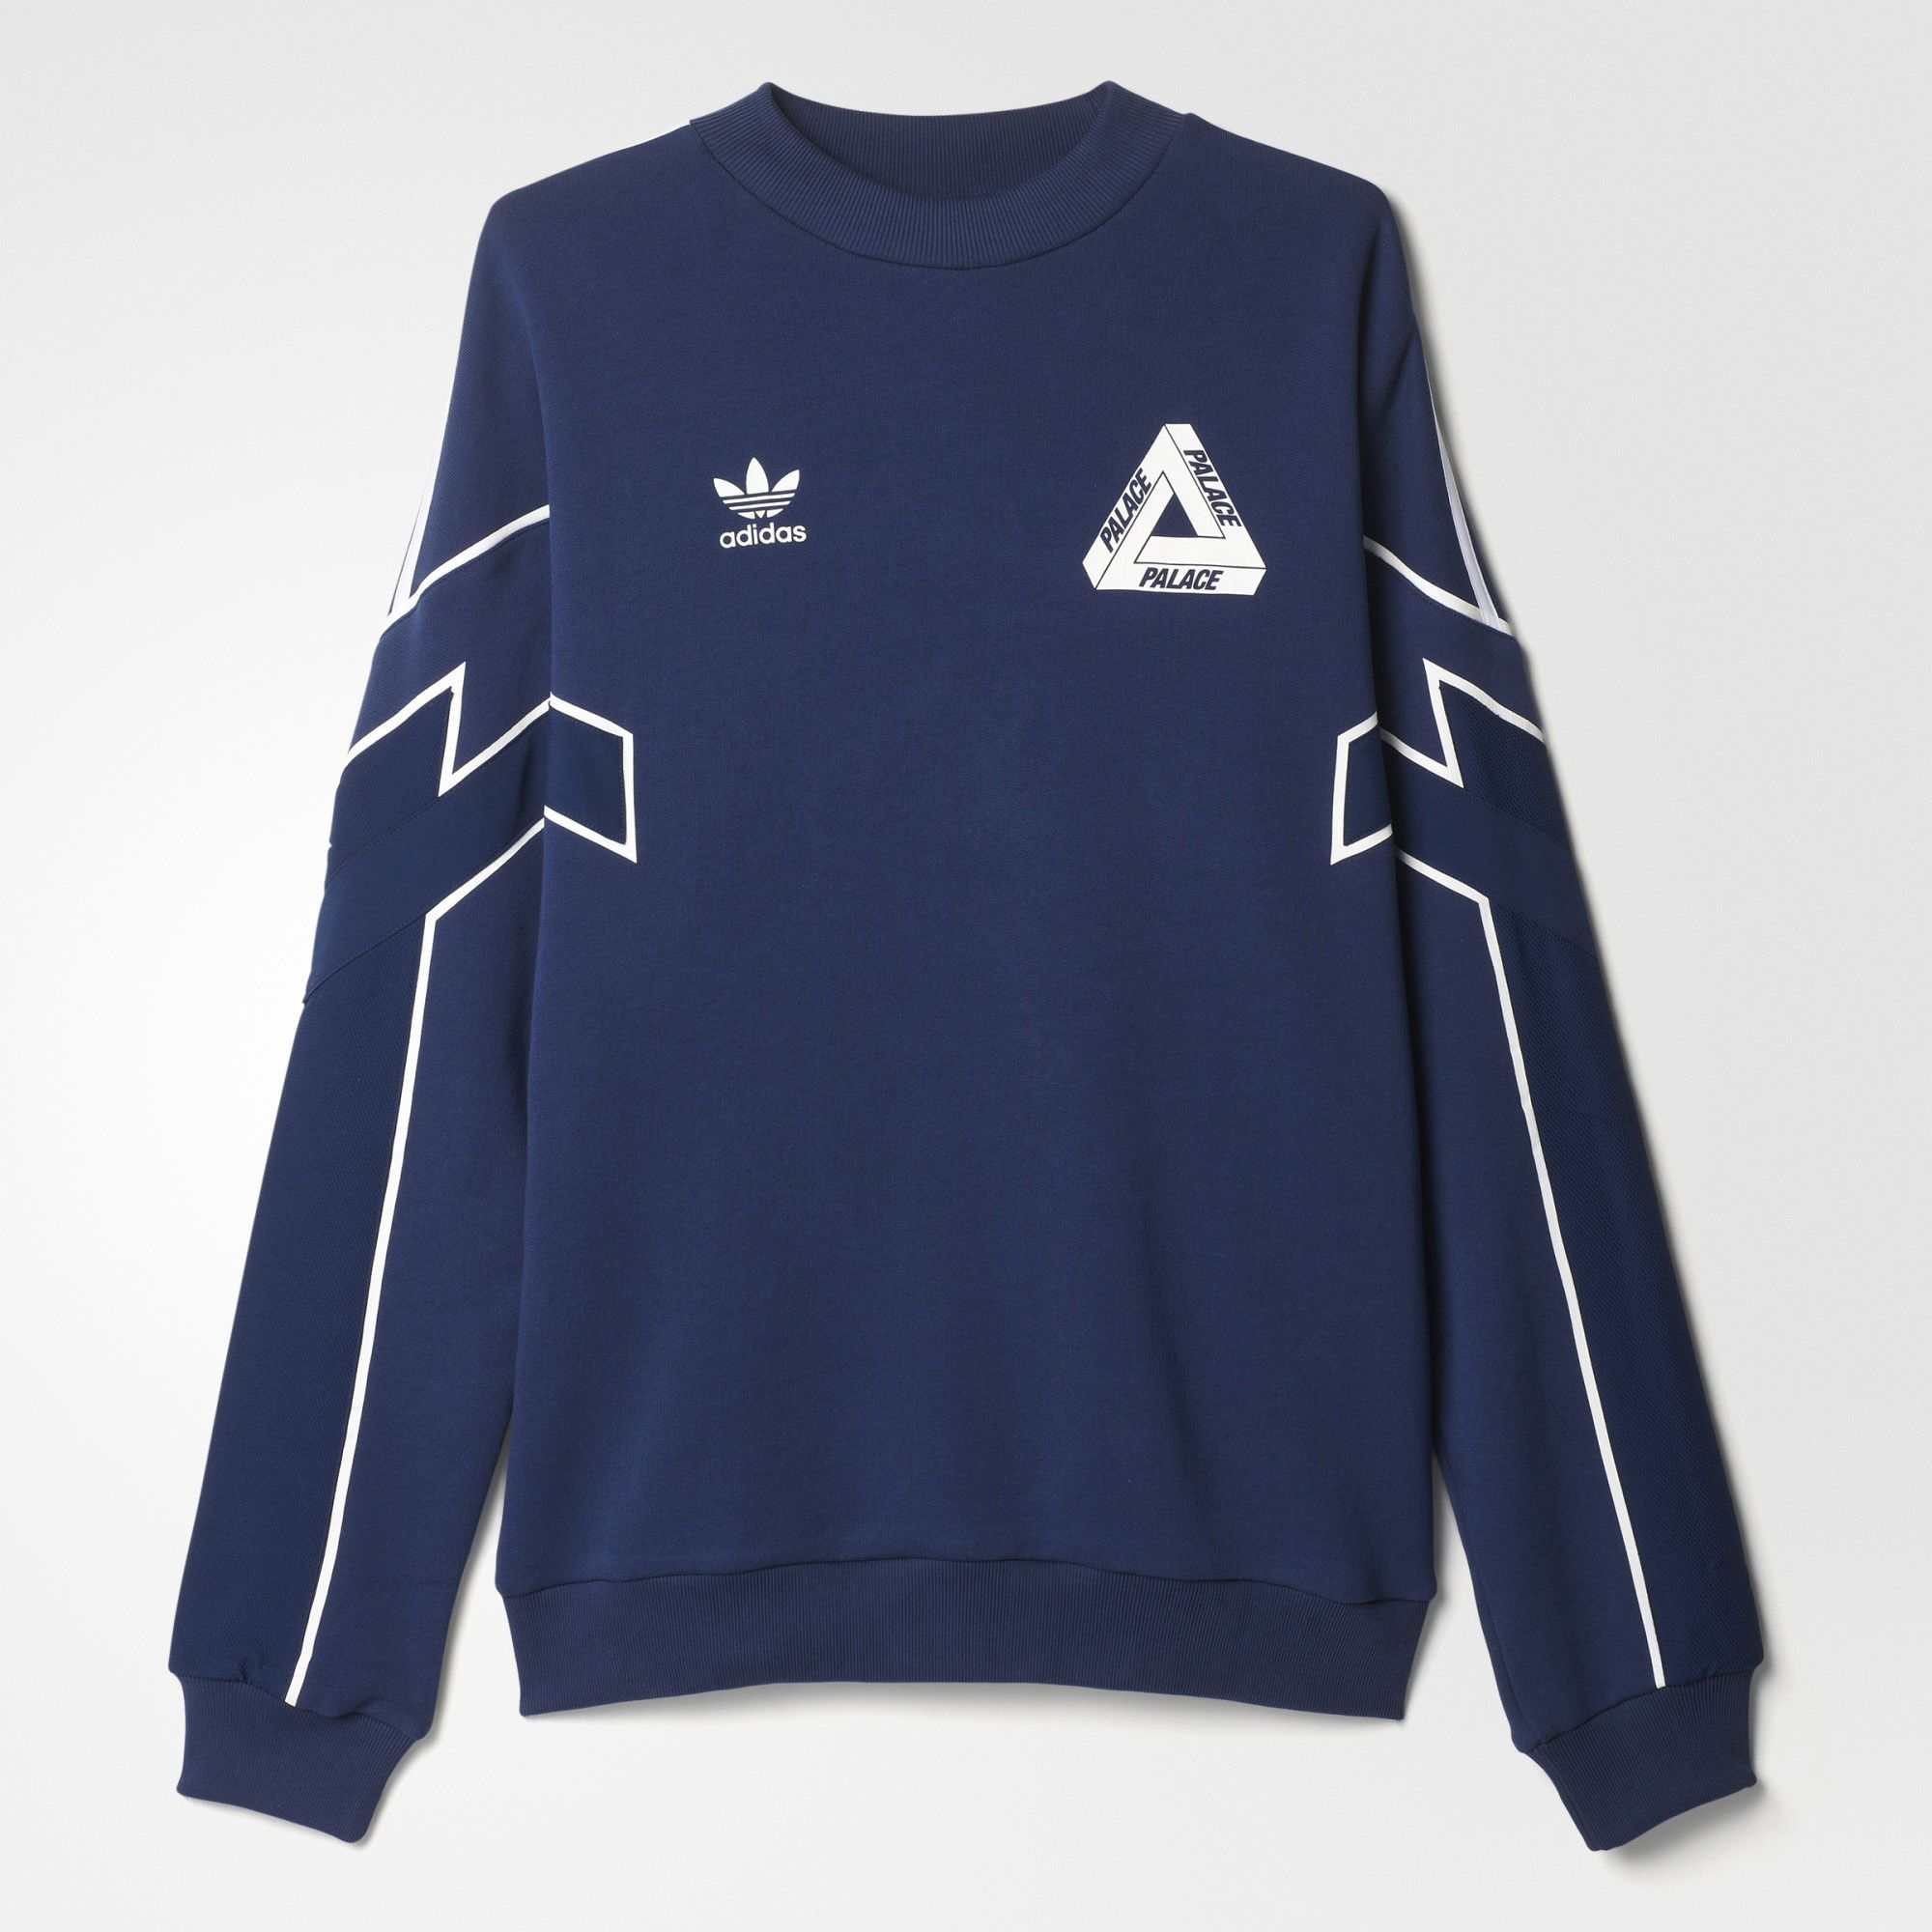 Back Soon Stronger Than Ever Vintage Sportswear Palace Clothing Long Sleeve Tshirt Men [ 2000 x 2000 Pixel ]